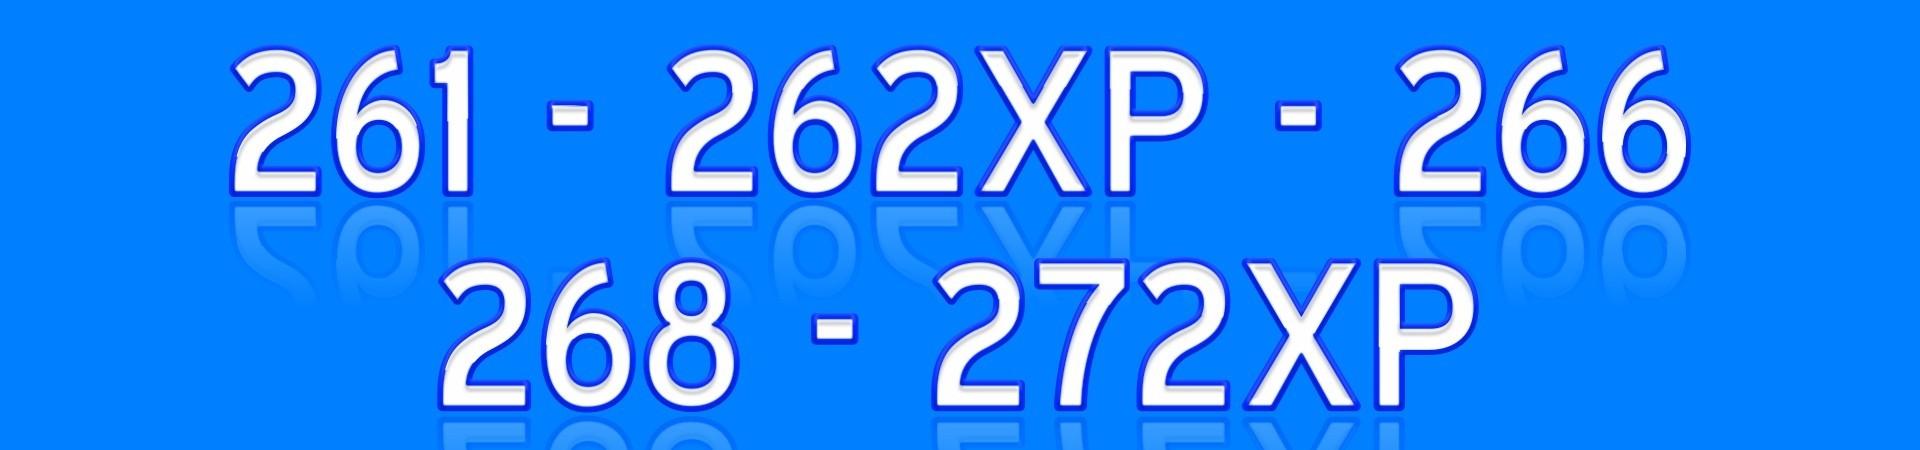 61 66 266 268 272